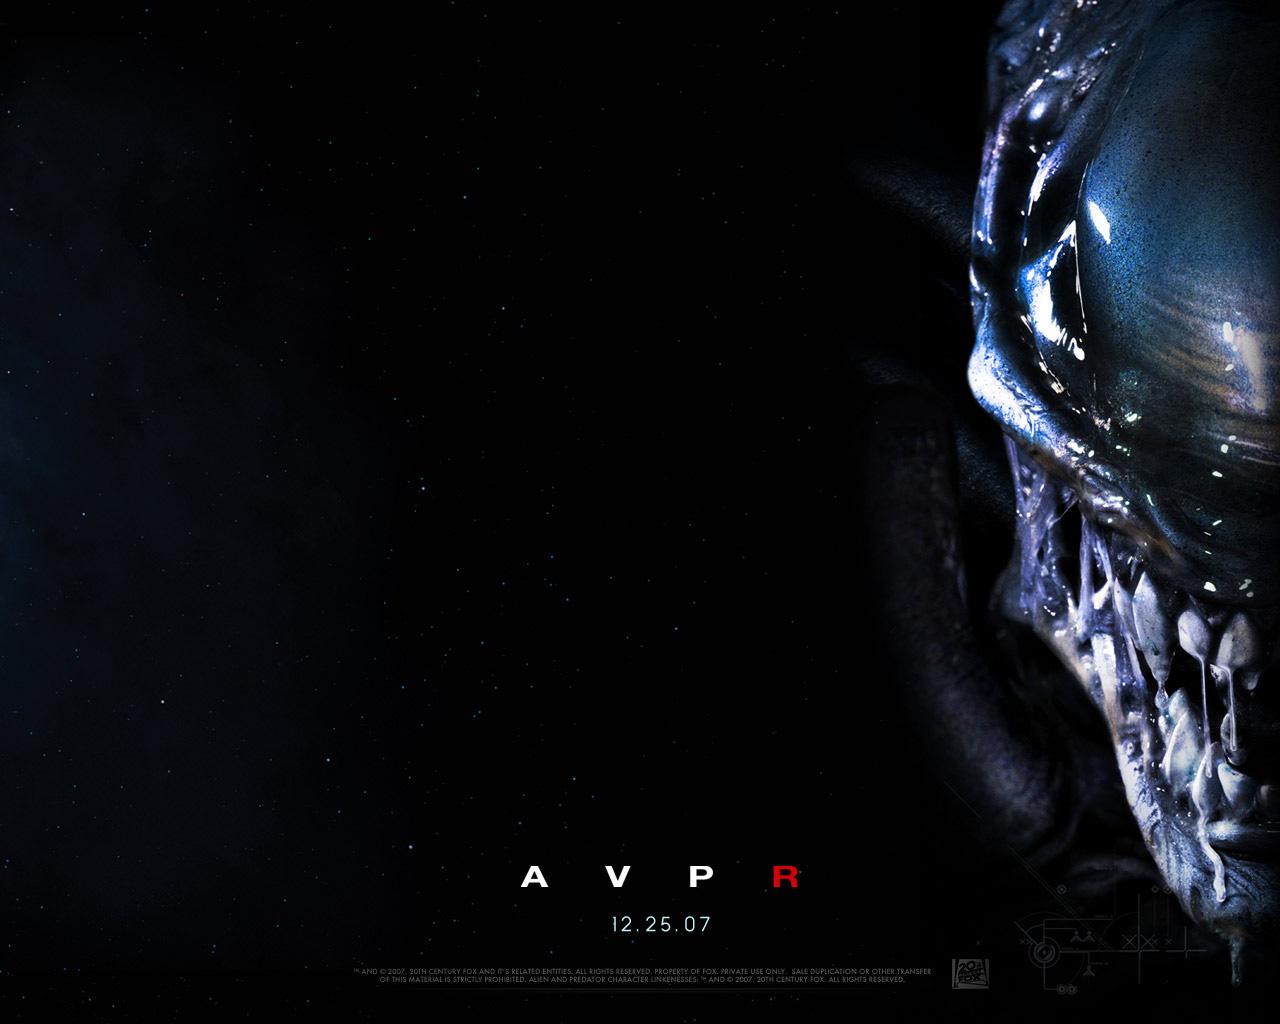 Alien Wallpapers Alien Myspace Backgrounds Alien Backgrounds For 1280x1024